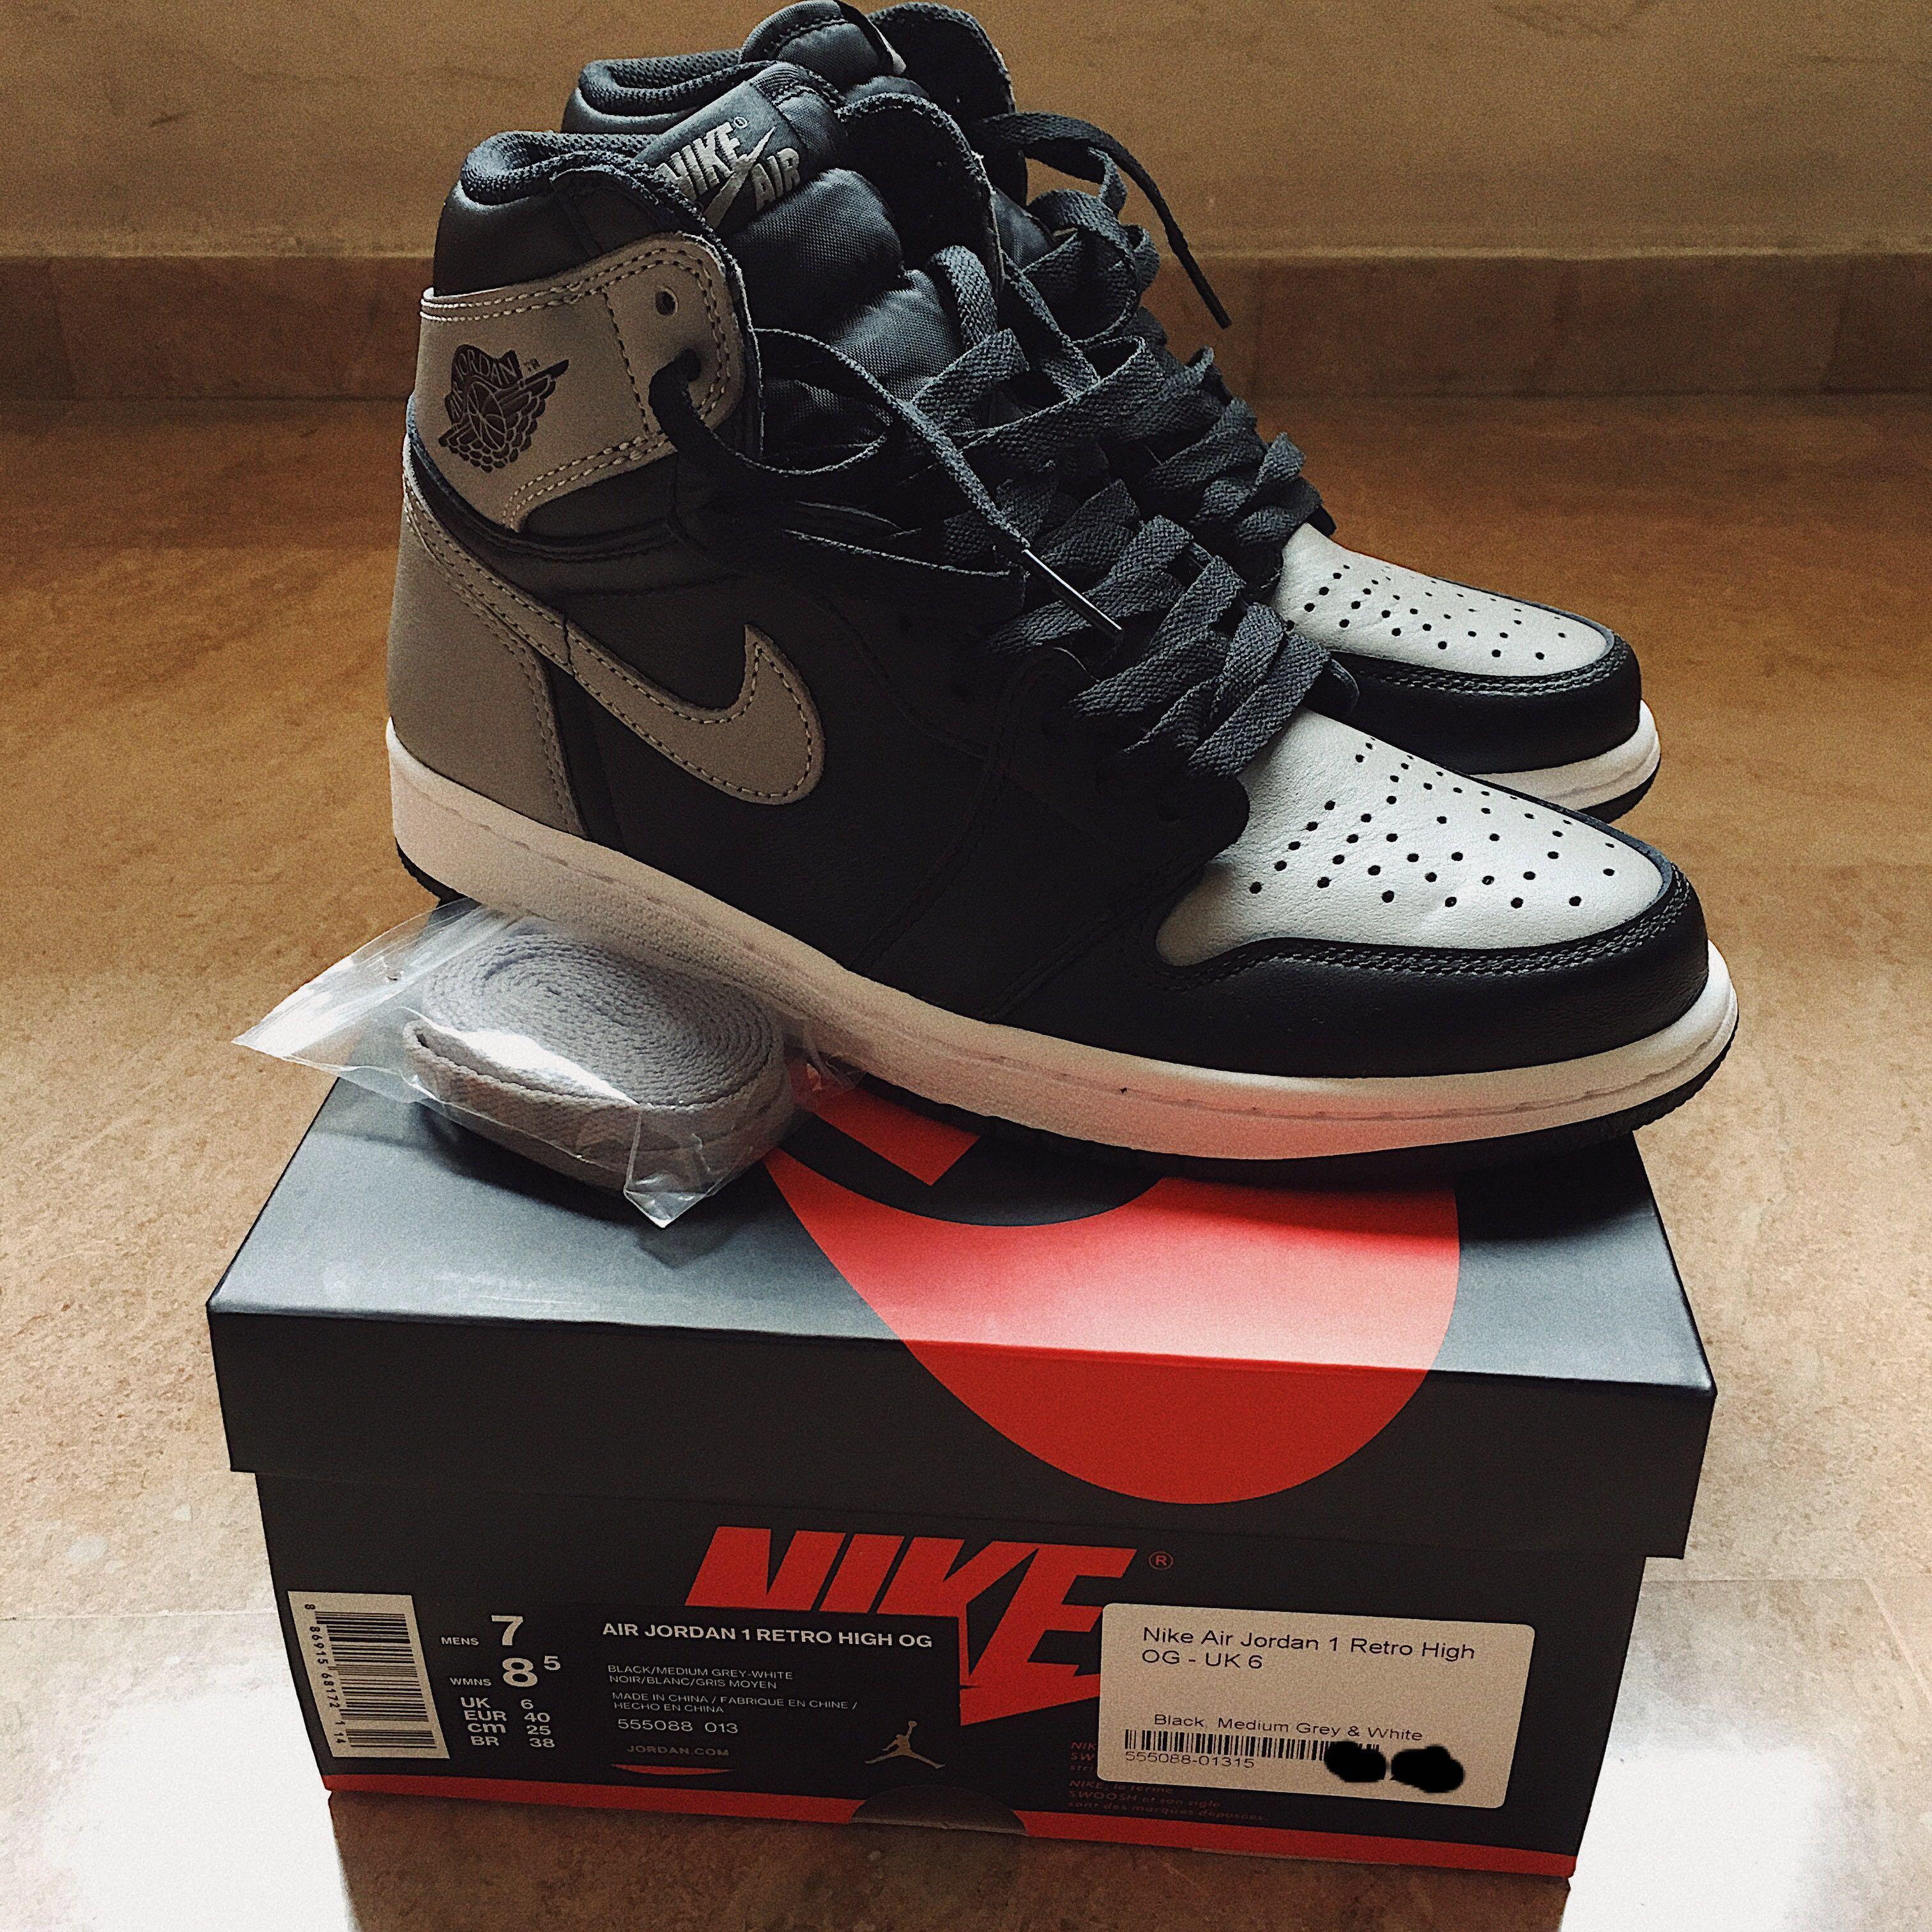 498b274539091 Nike Air Jordan 1 Retro High OG